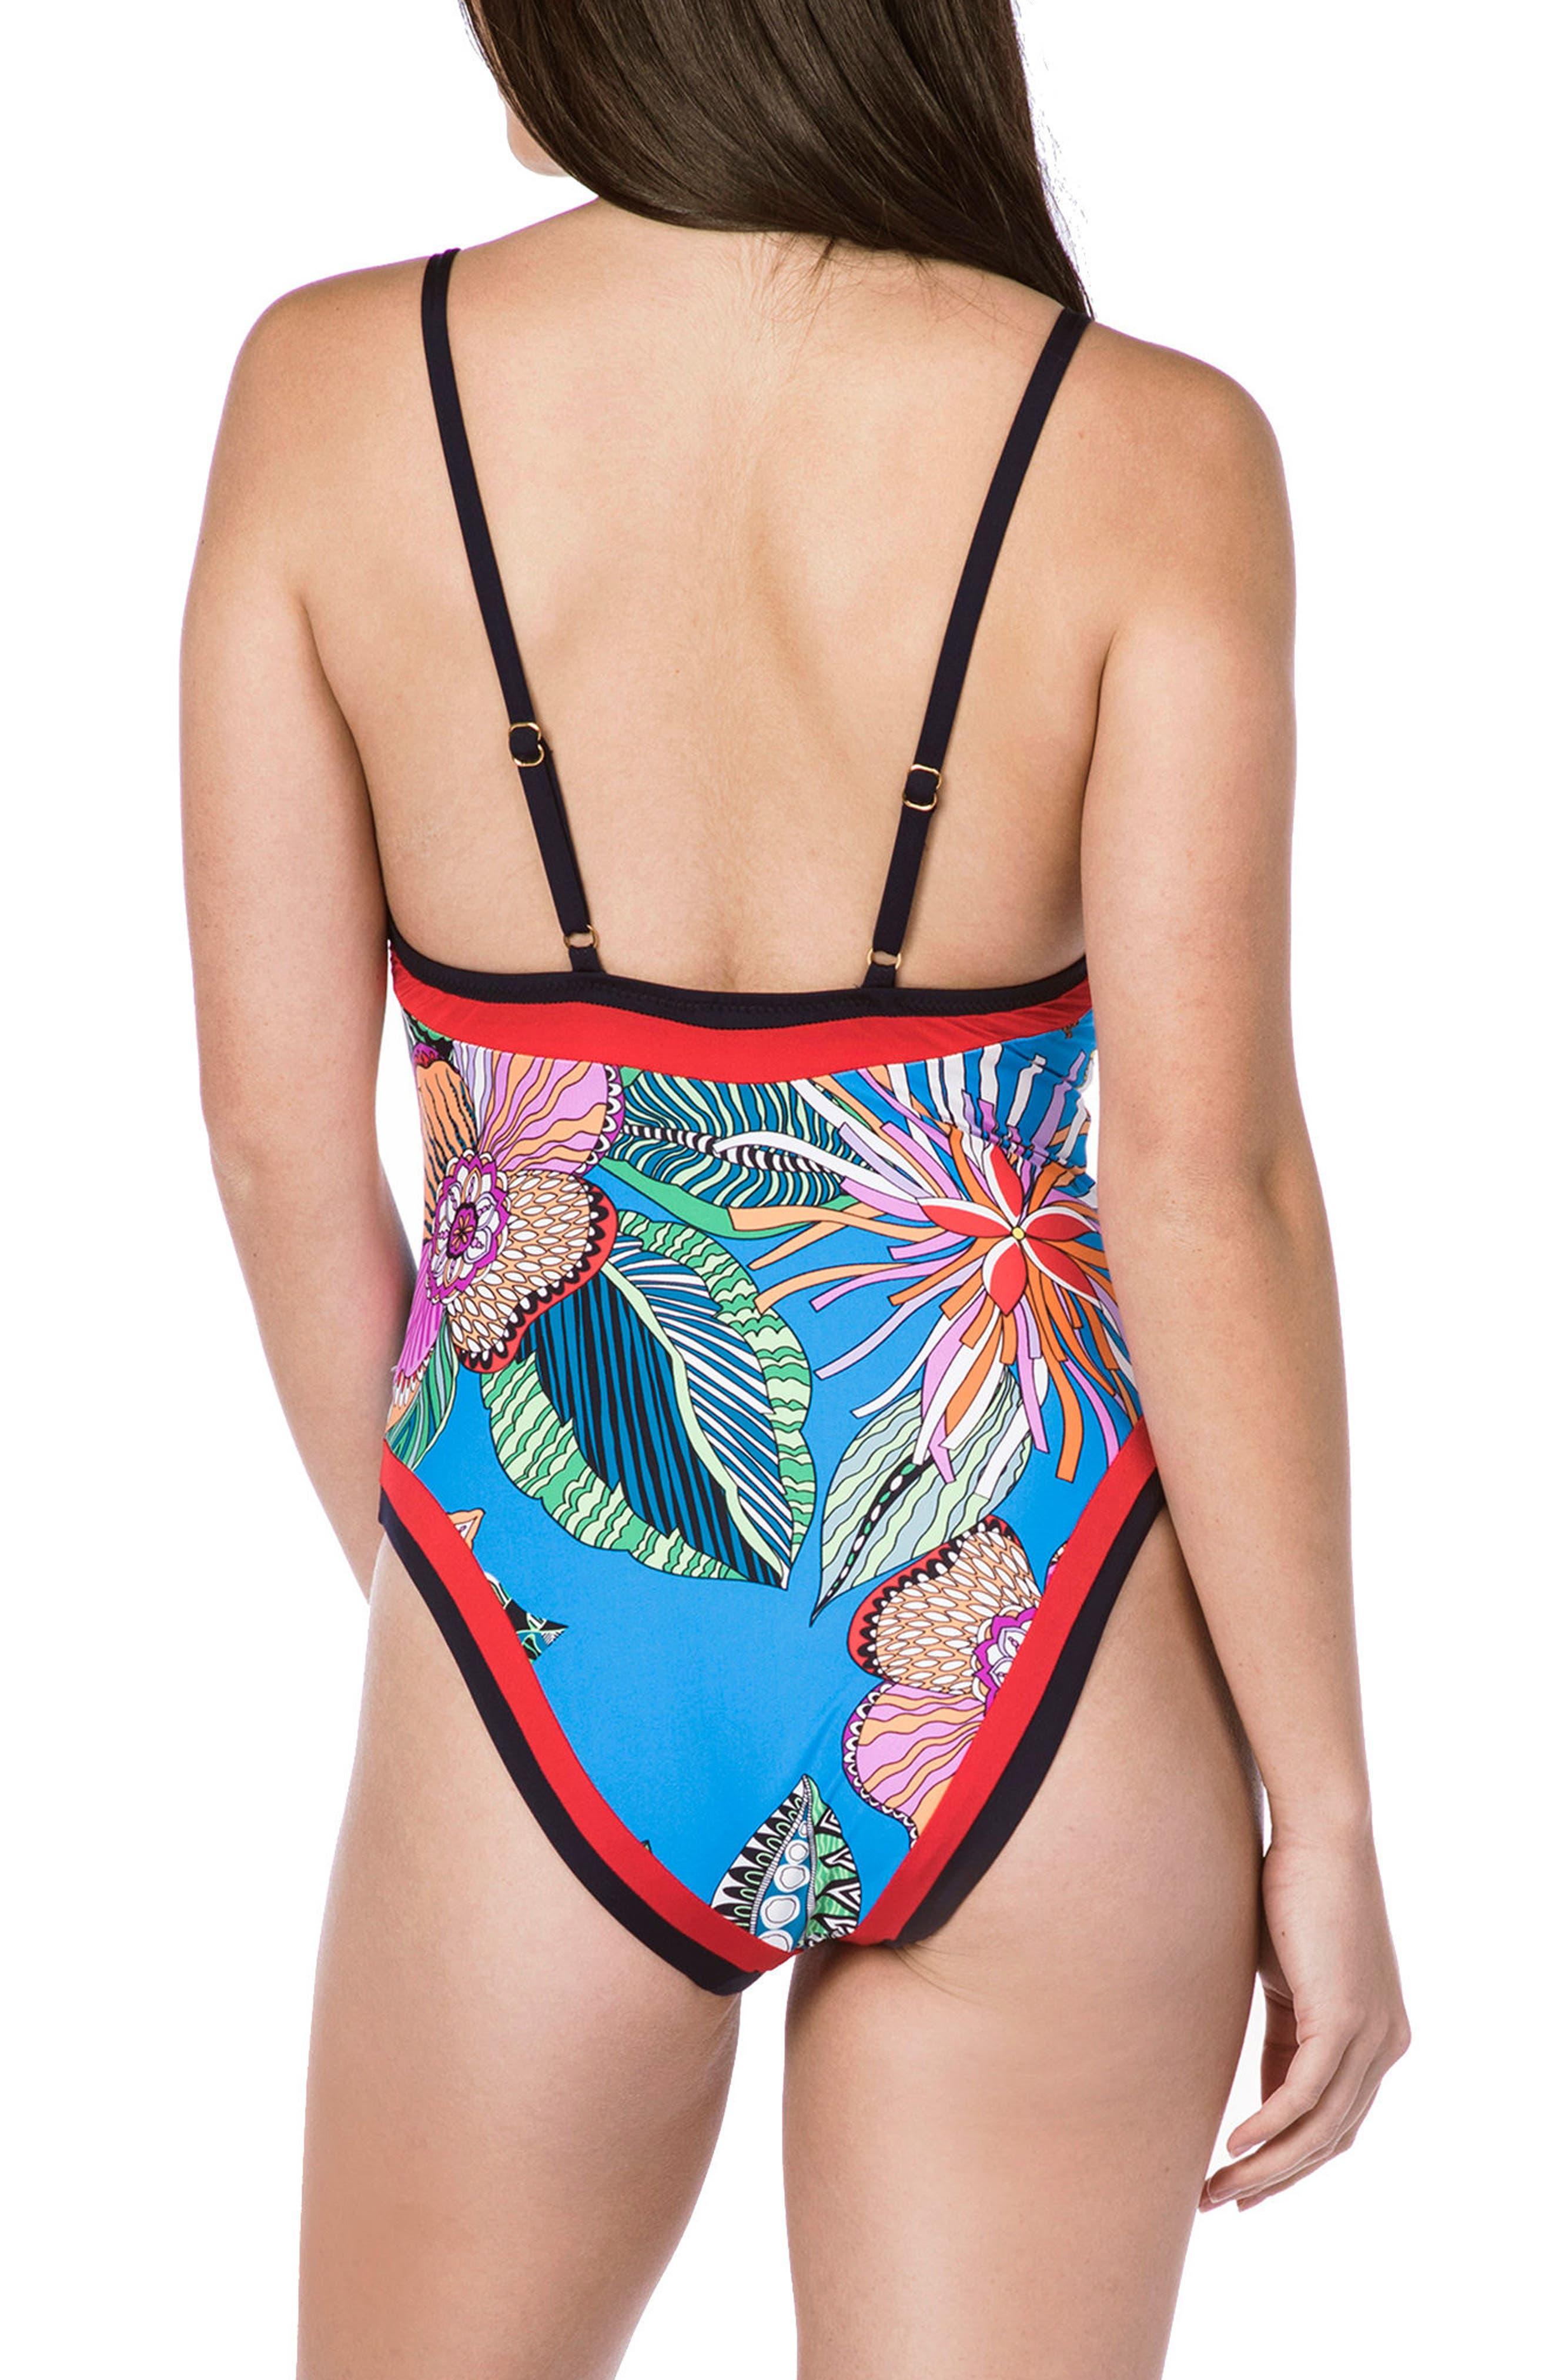 Tahiti Tropical One-Piece Swimsuit,                             Alternate thumbnail 2, color,                             BLUE MULTI